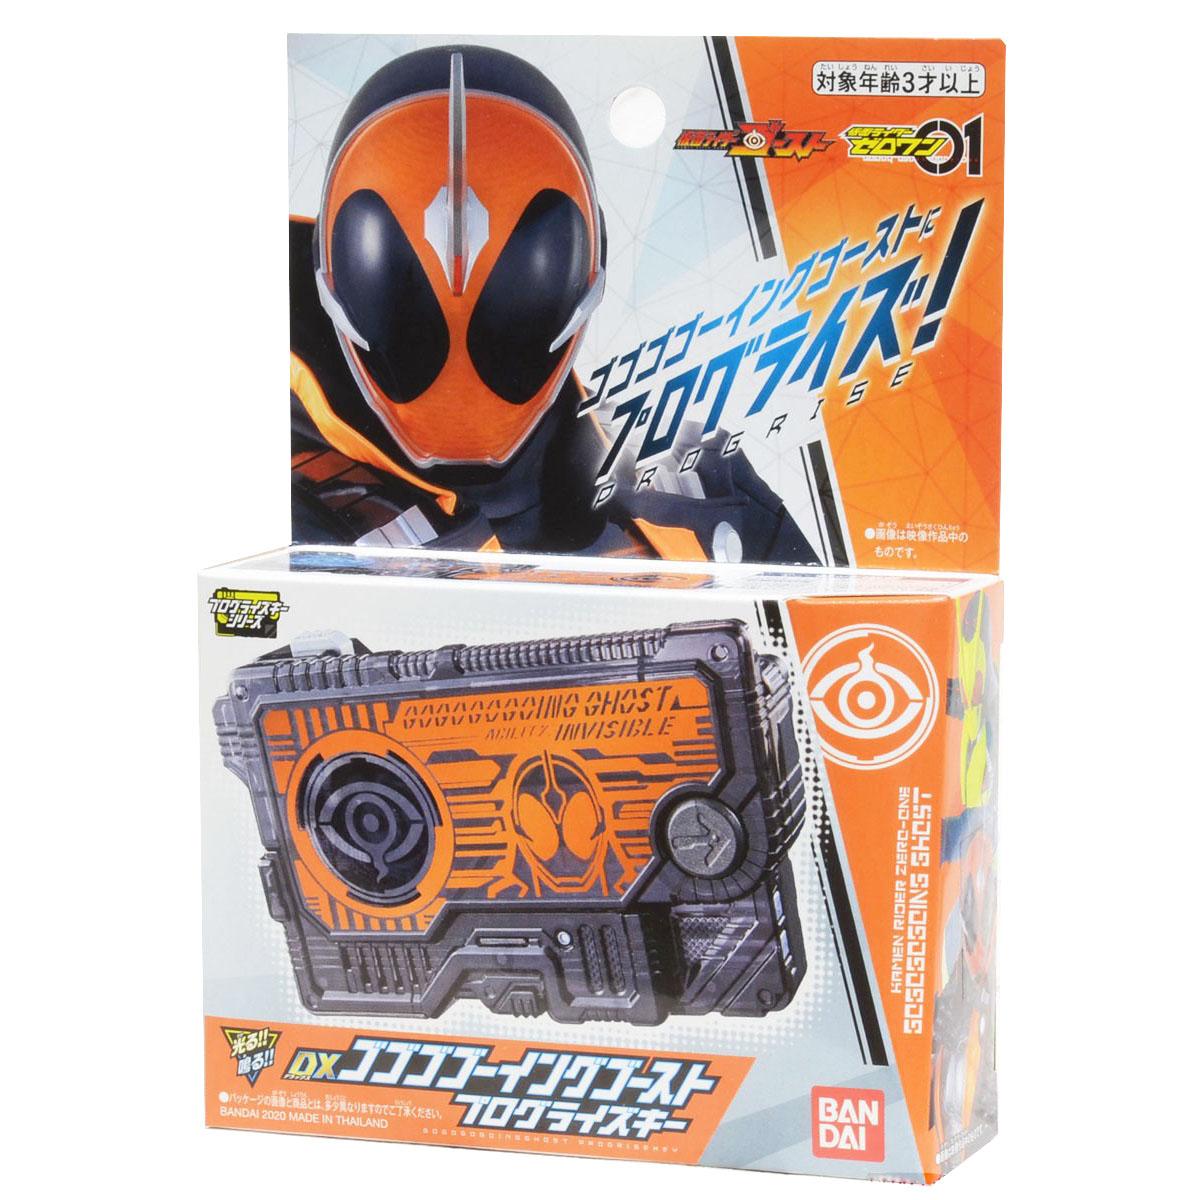 BANDAI Kamen Rider Zero-One GoGoGo Going Ghost Progrise Key JAPAN OFFICIAL